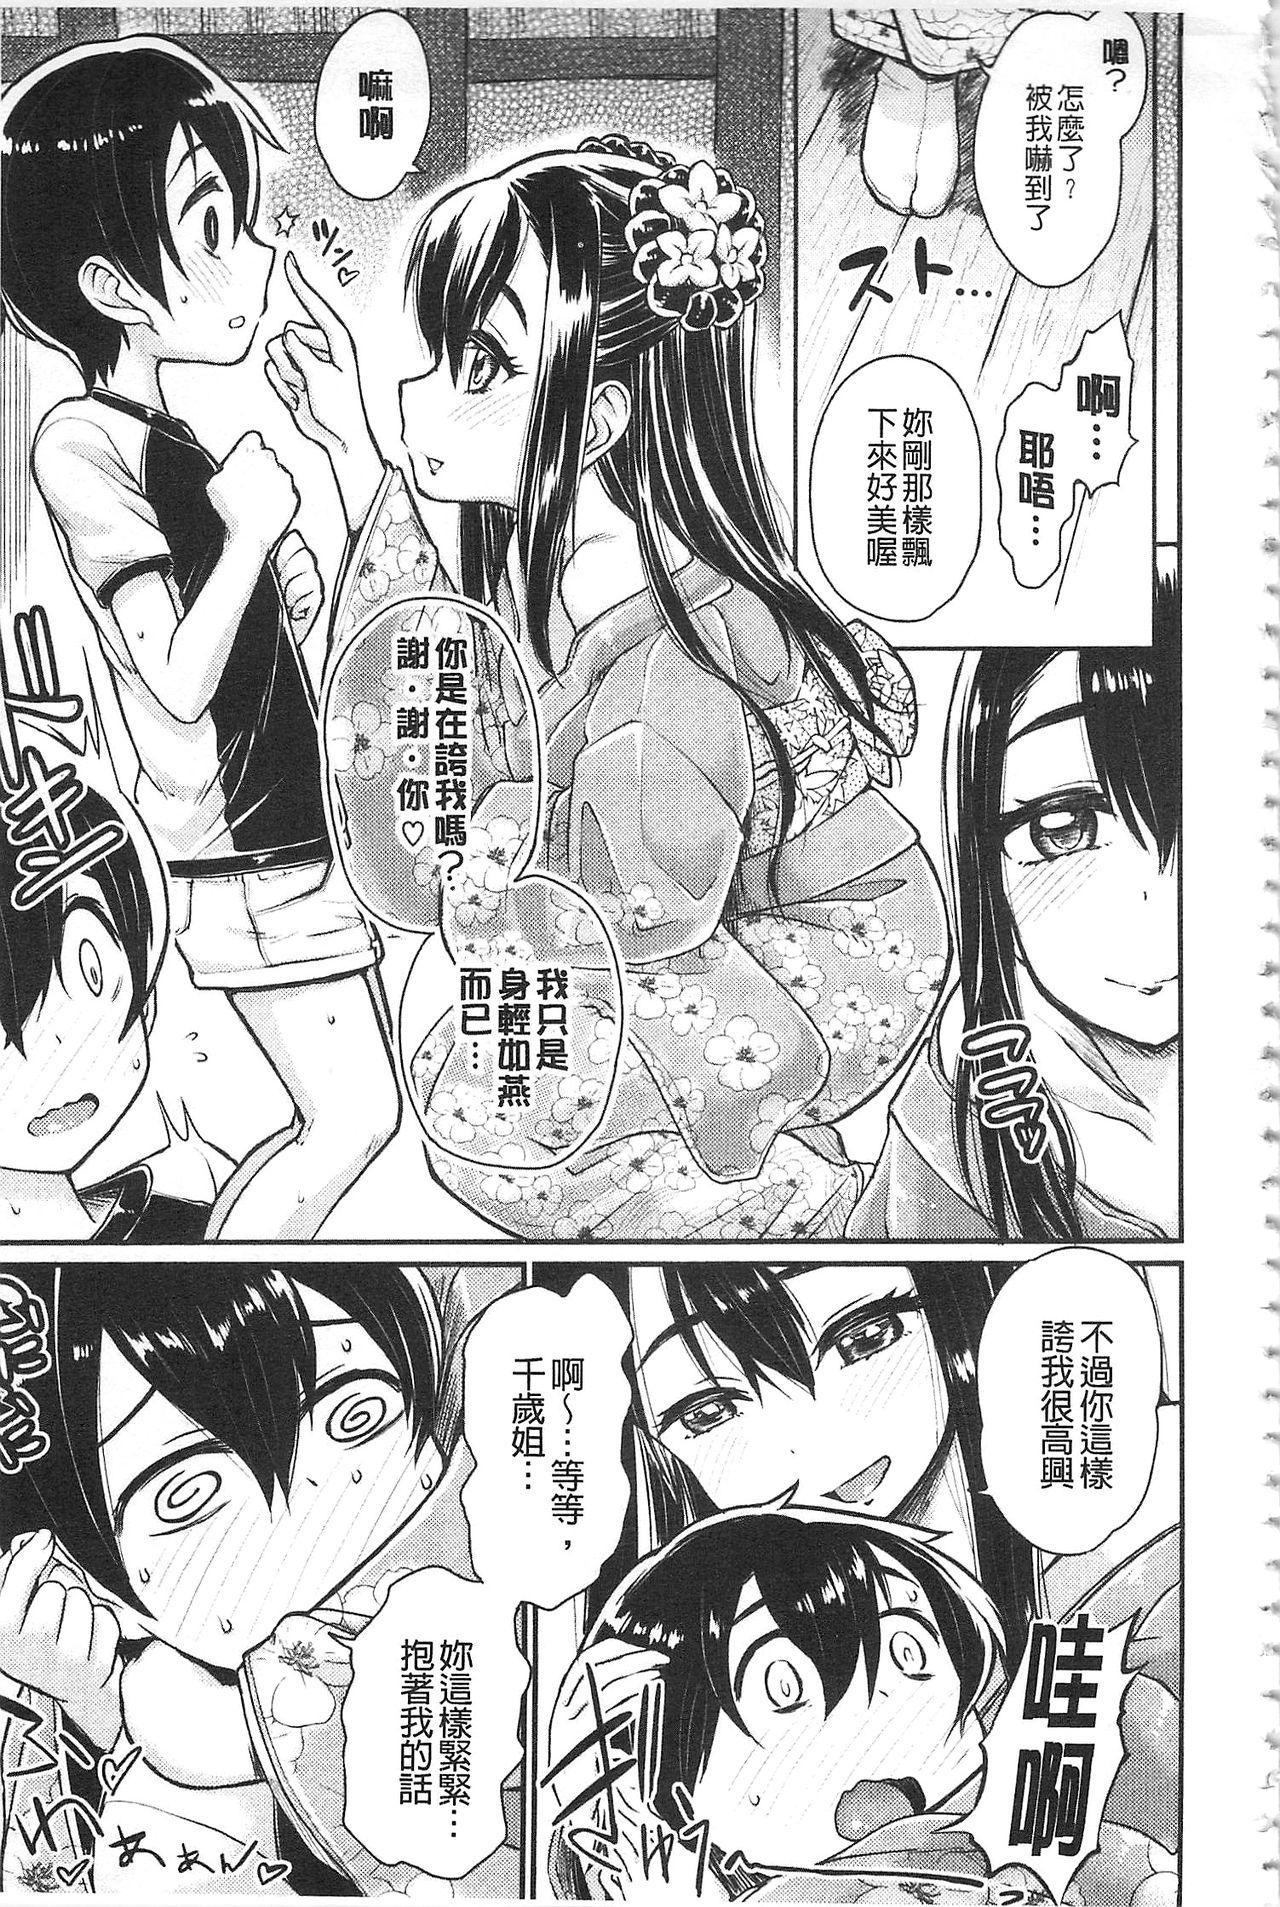 Sakusei Carnival - It's Carnival of sucks sperm!   搾精的嘉年華會 52